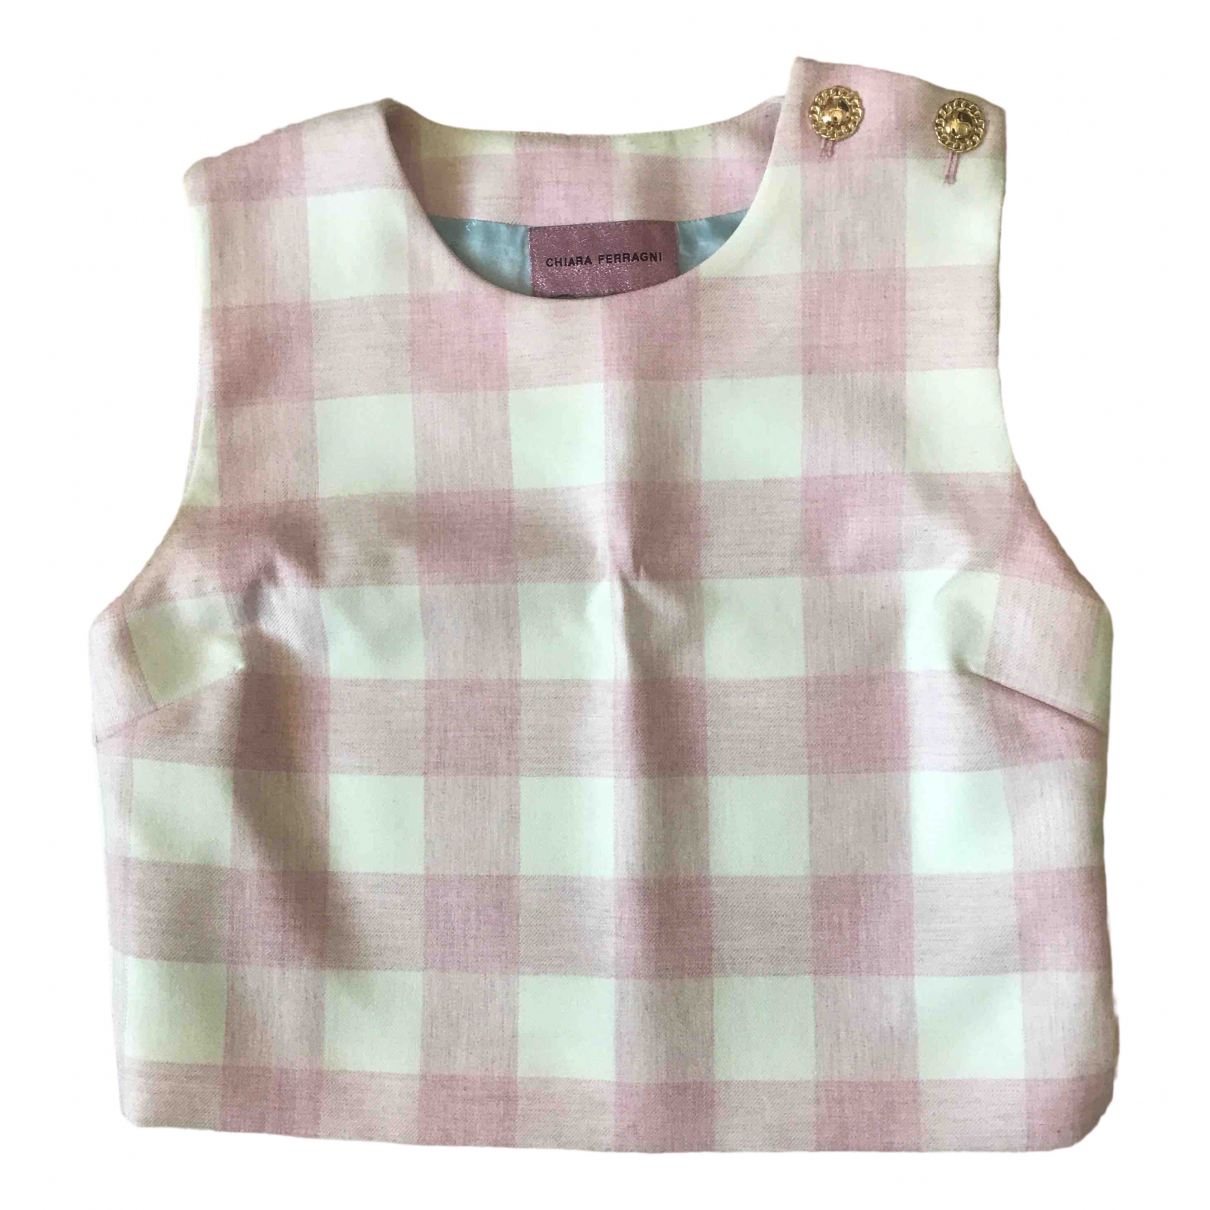 Chiara Ferragni \N Pink  top for Women S International